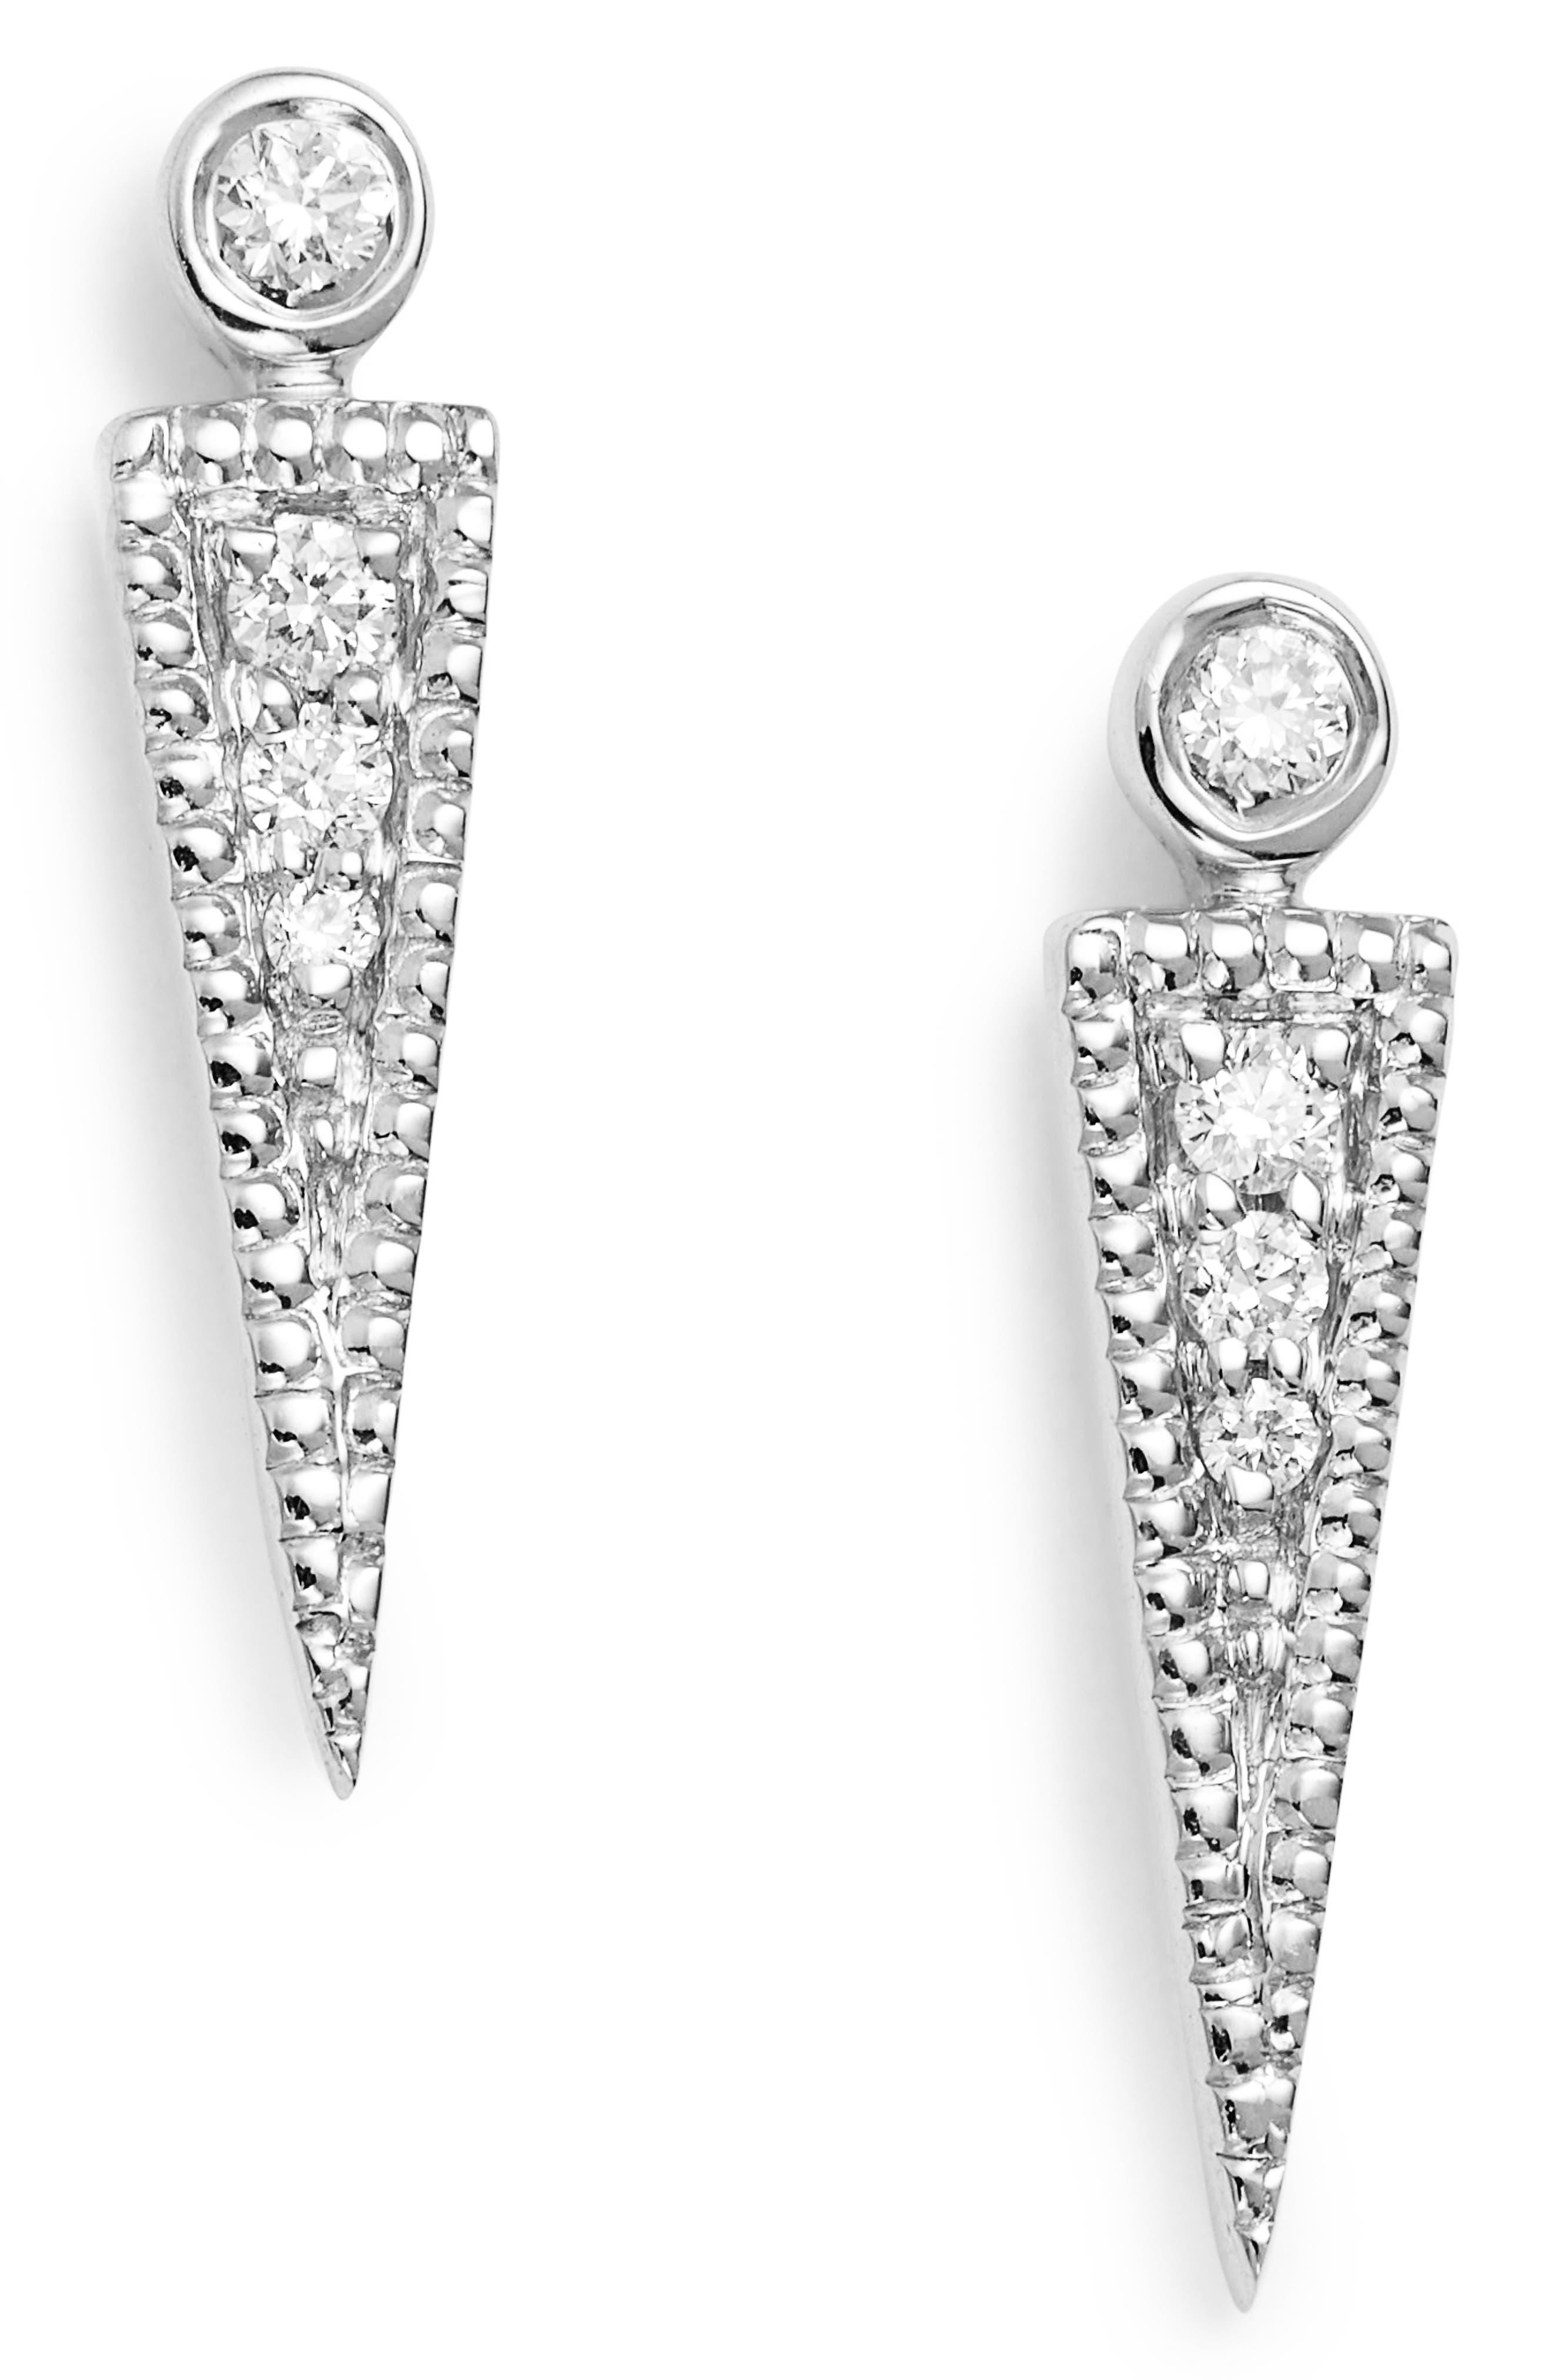 Dana Rebecca Samantha Lynn Diamond Dagger Earrings